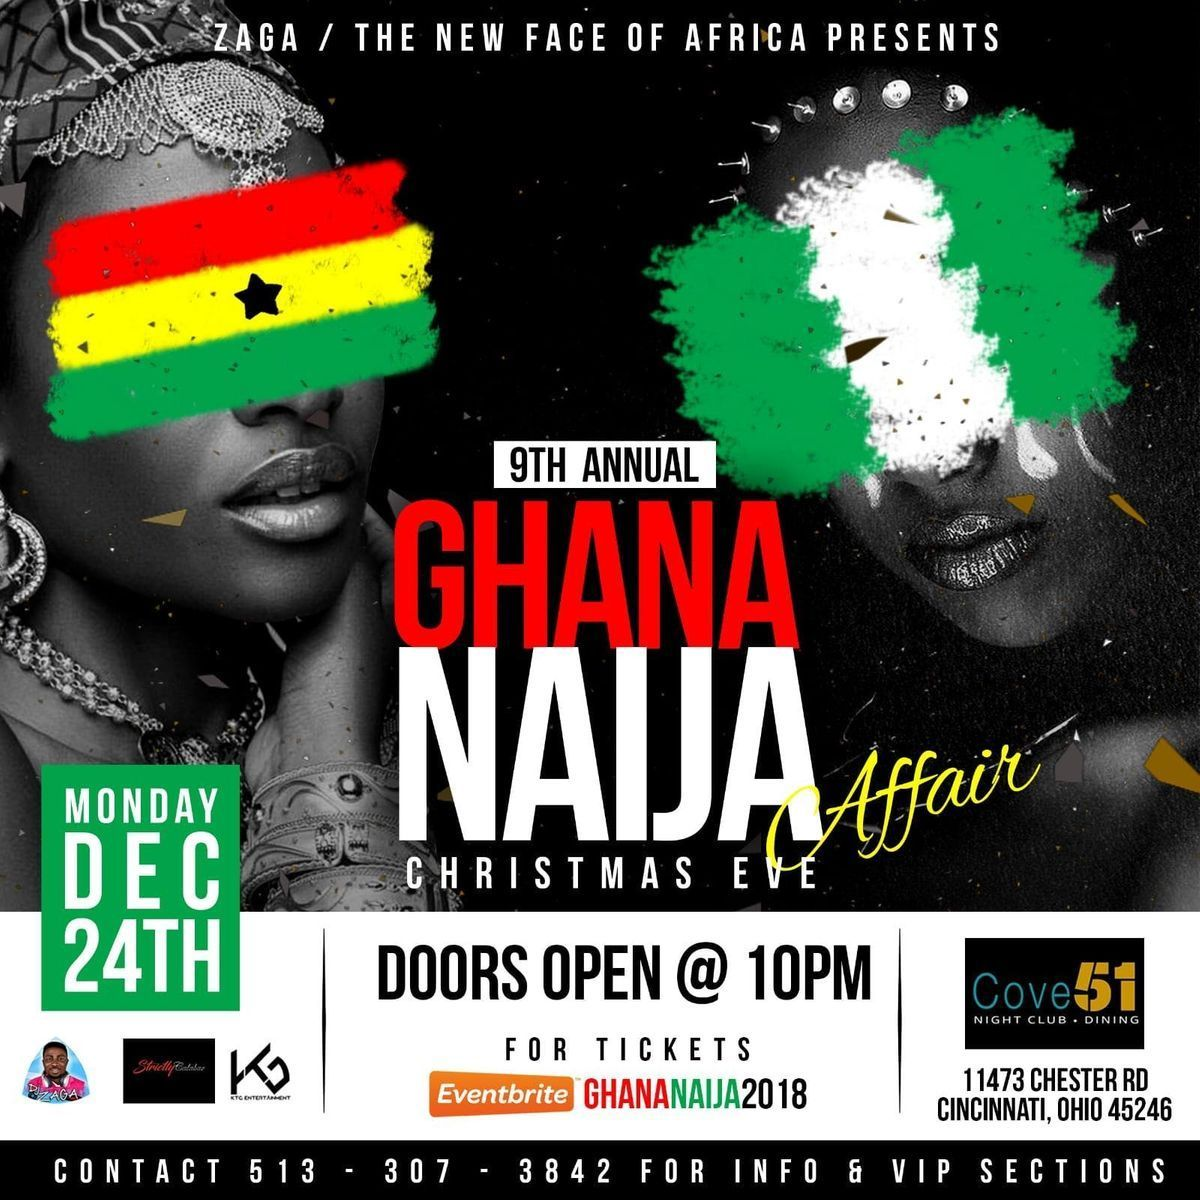 THE 9TH ANNUAL GHANA-NAIJA AFFAIR